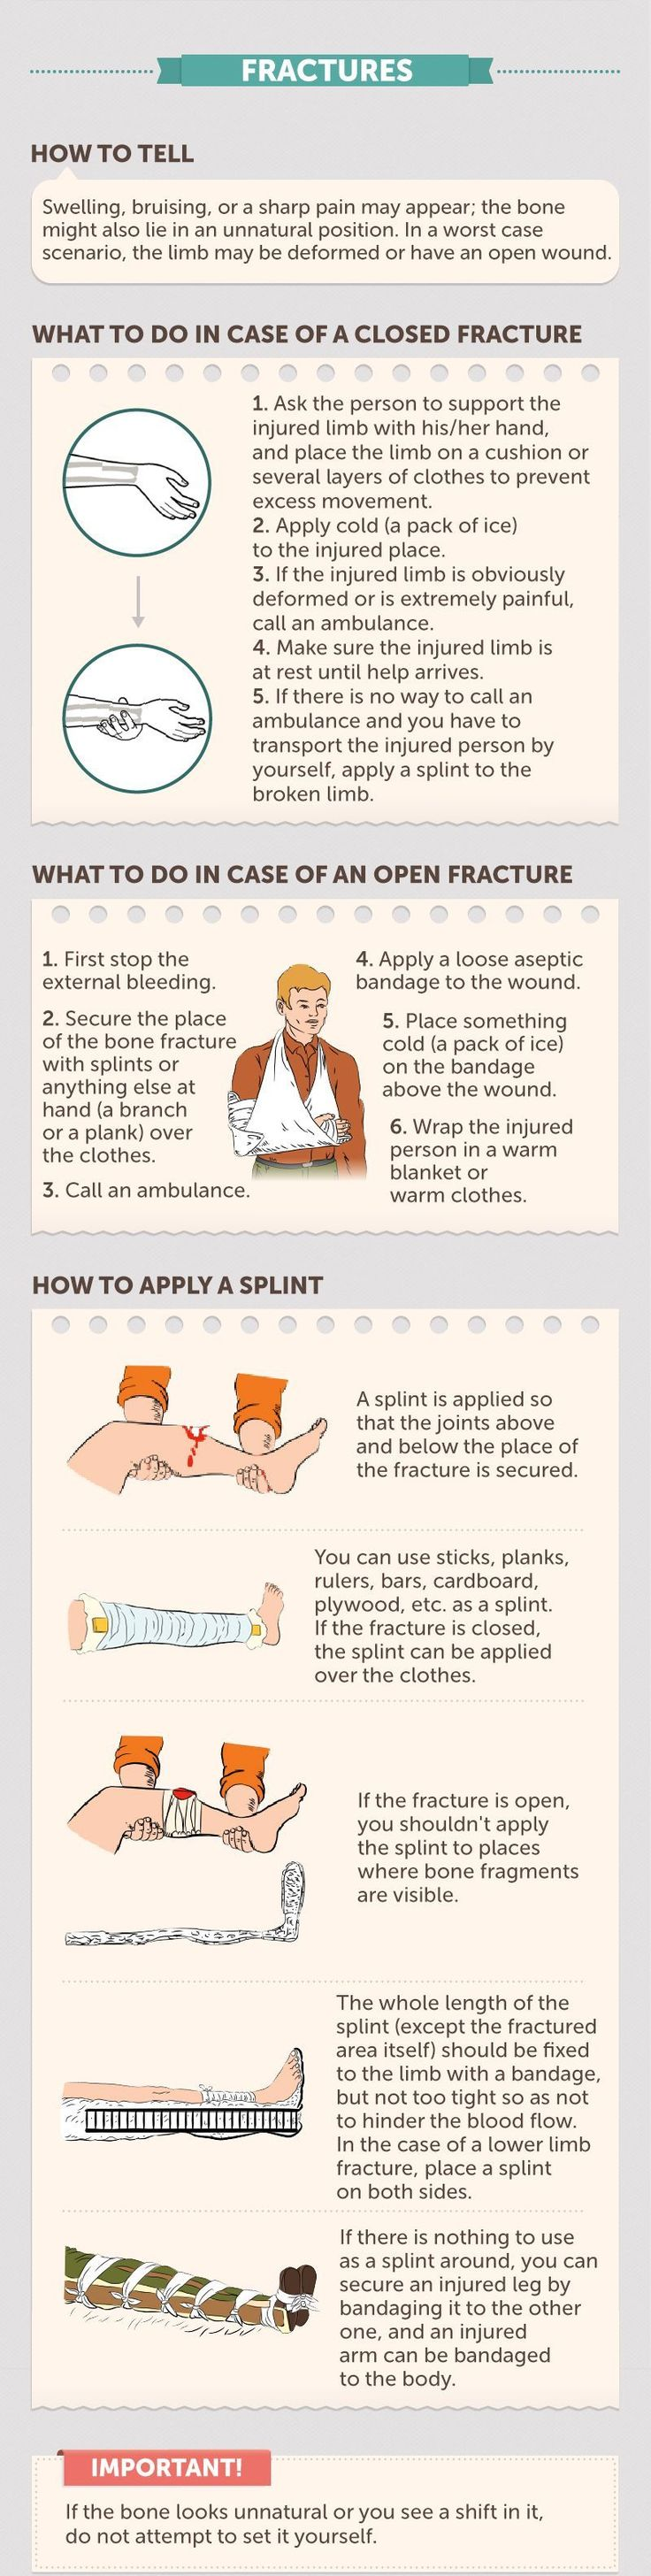 First Aid Basics for Fractures - 43 Usefull Hiking Tips and Tricks #SurvivalSkillsMedicine